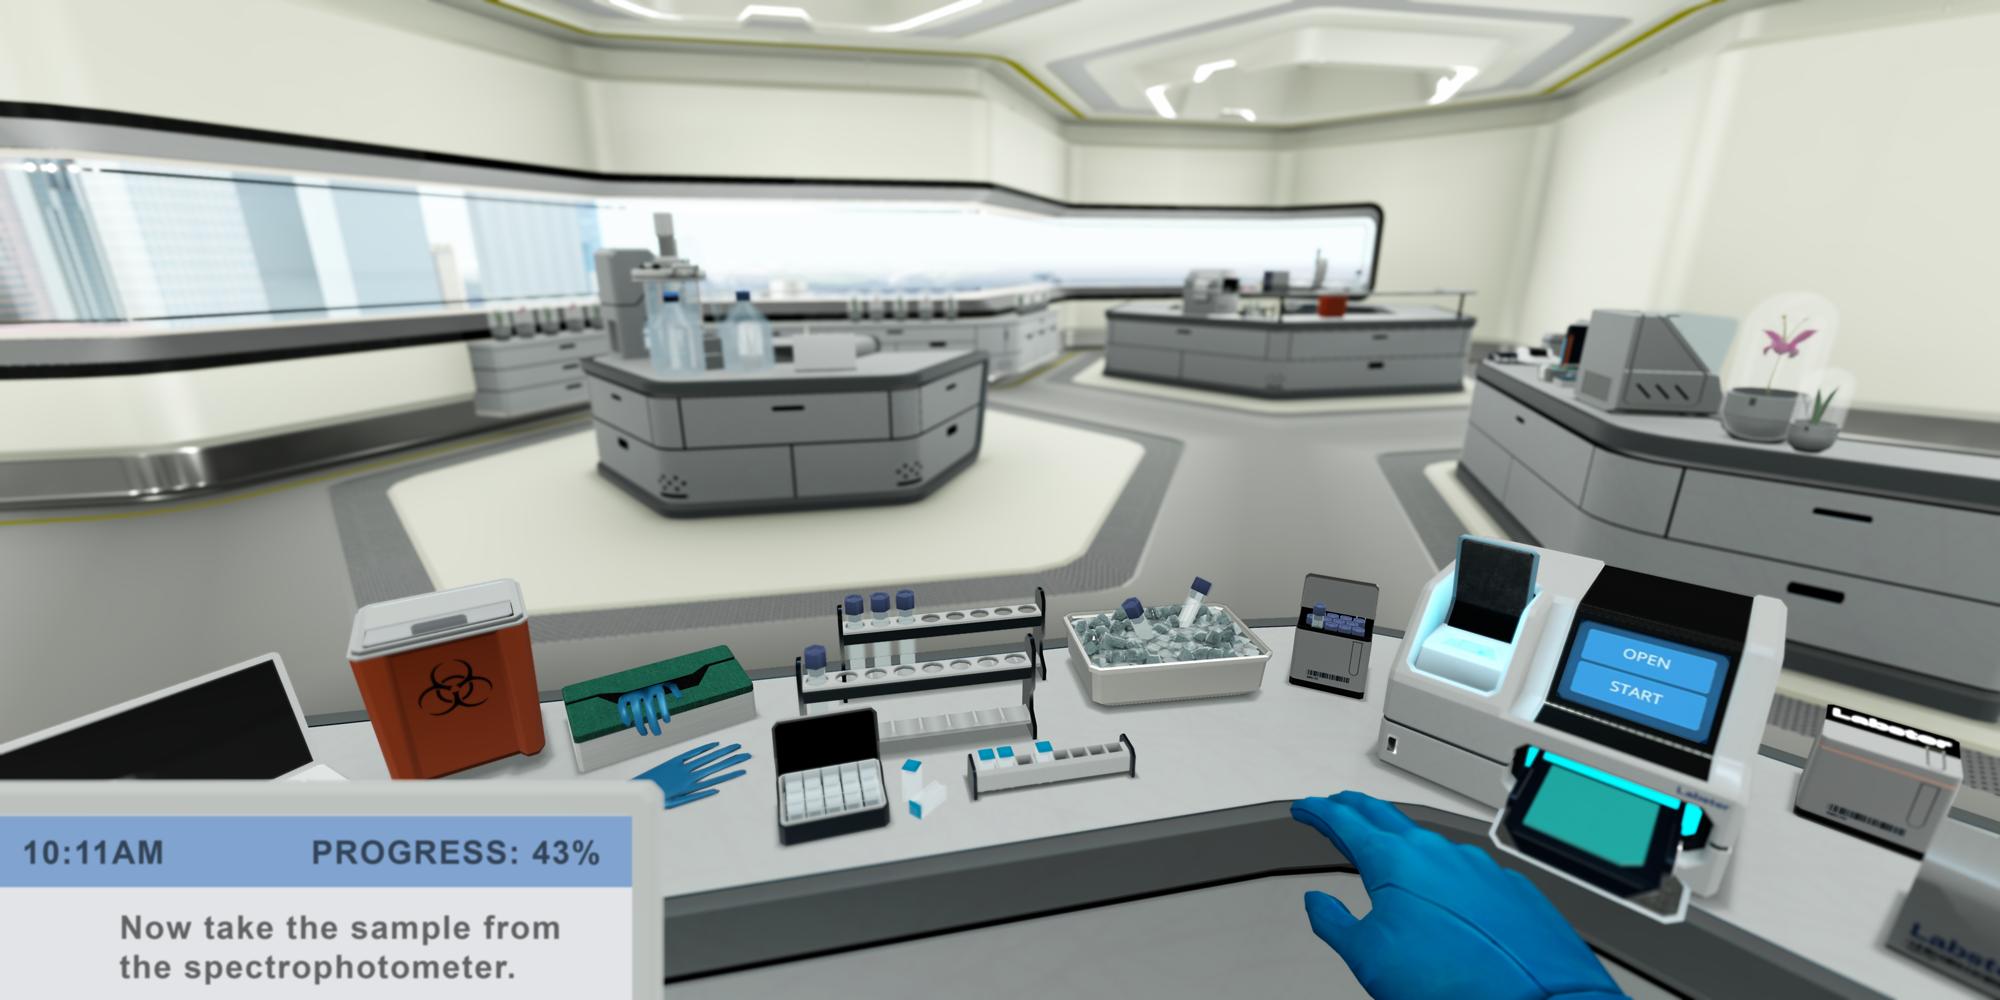 3D虚拟实验室解决方案商Labster宣布获900万美元融资